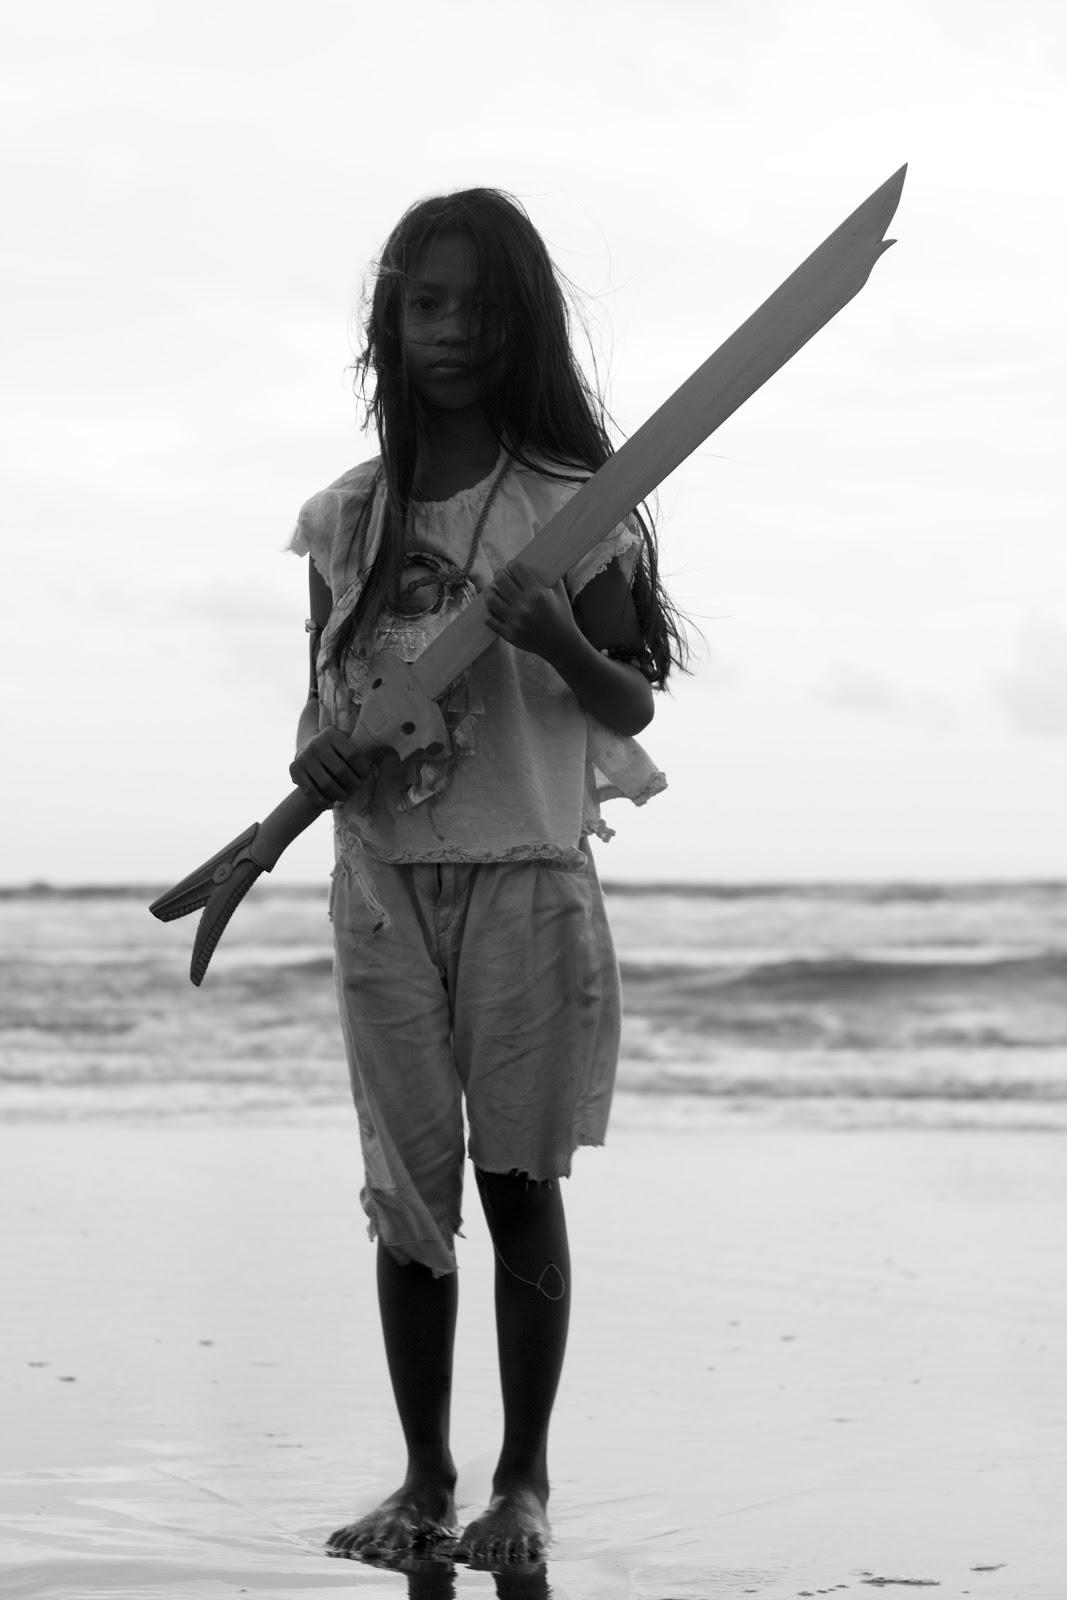 Gryshyll Reyes as Riana. Photo by Ansperniel Aquino